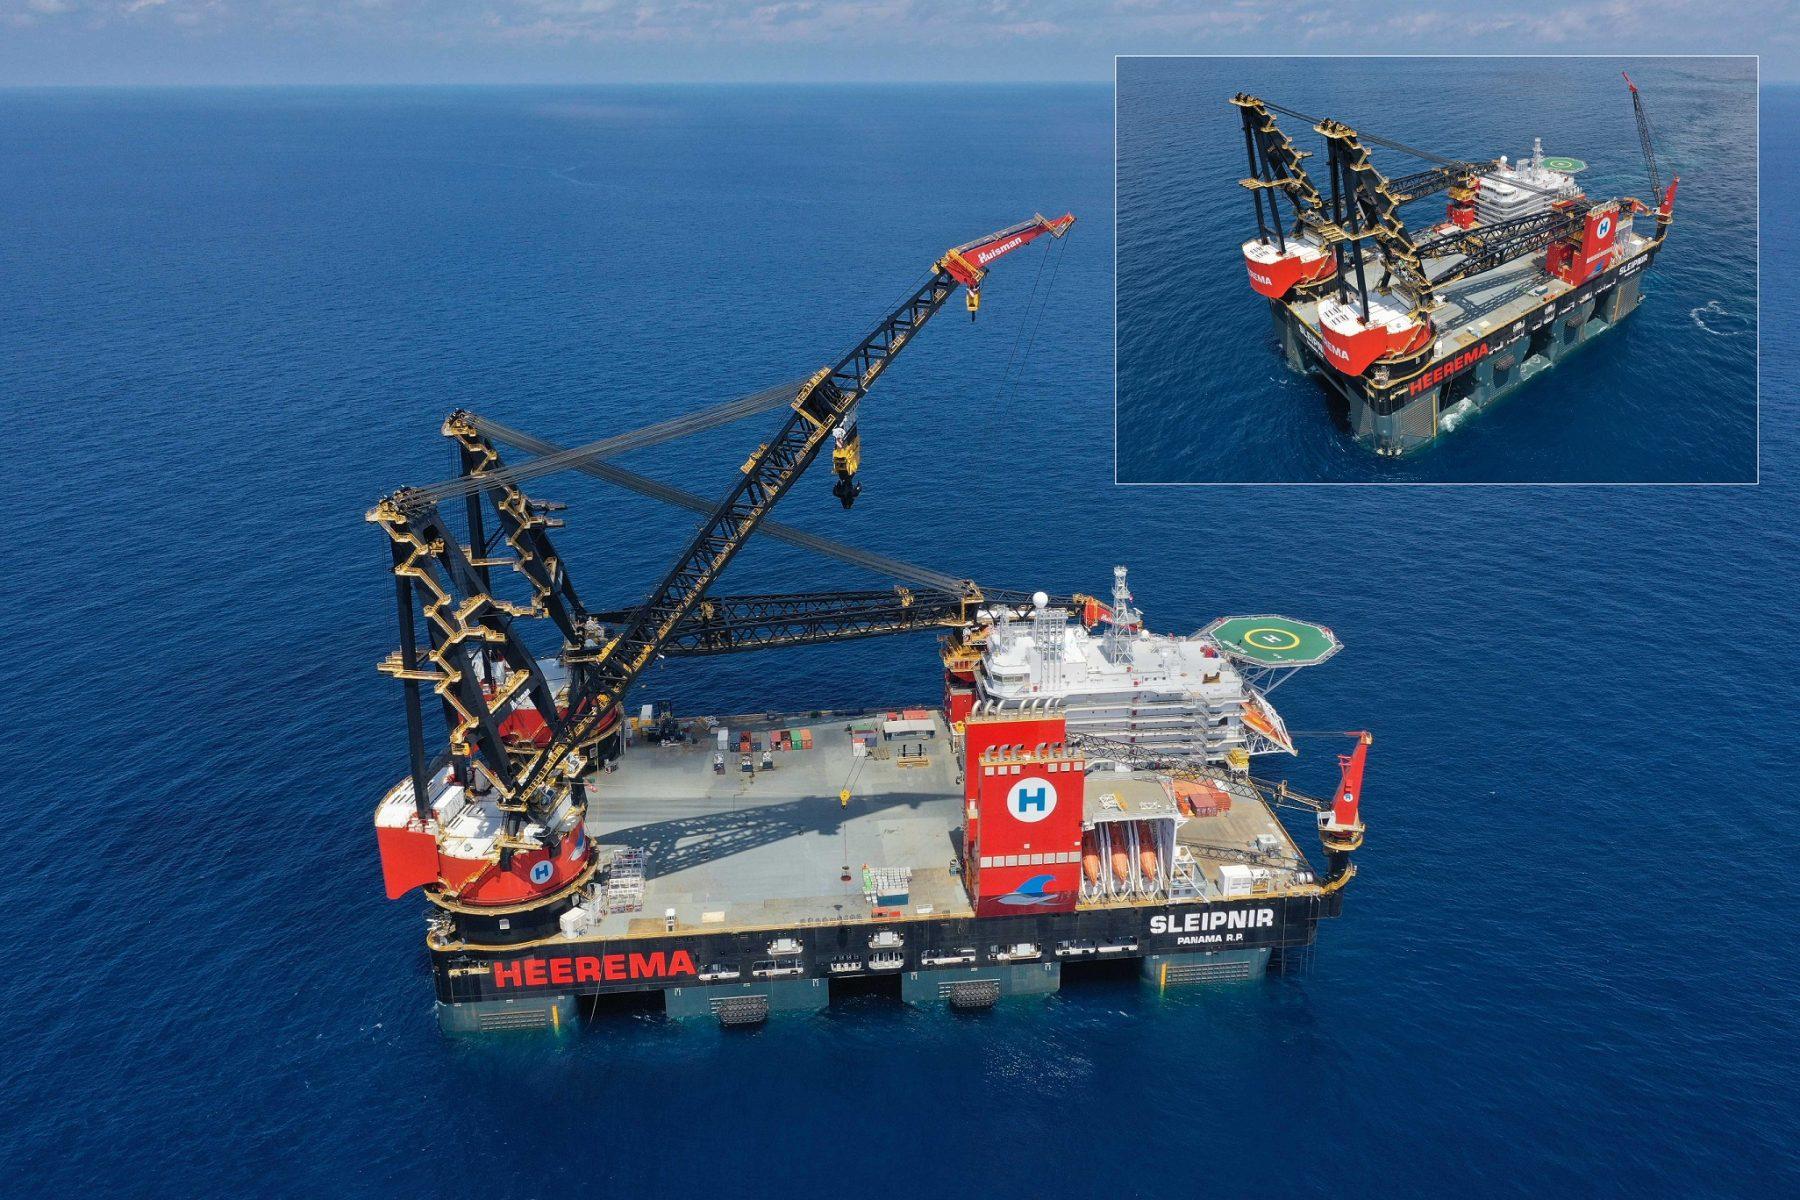 Heerema's Sleipnir, the World's Biggest Semi-Submersible Crane Vessel